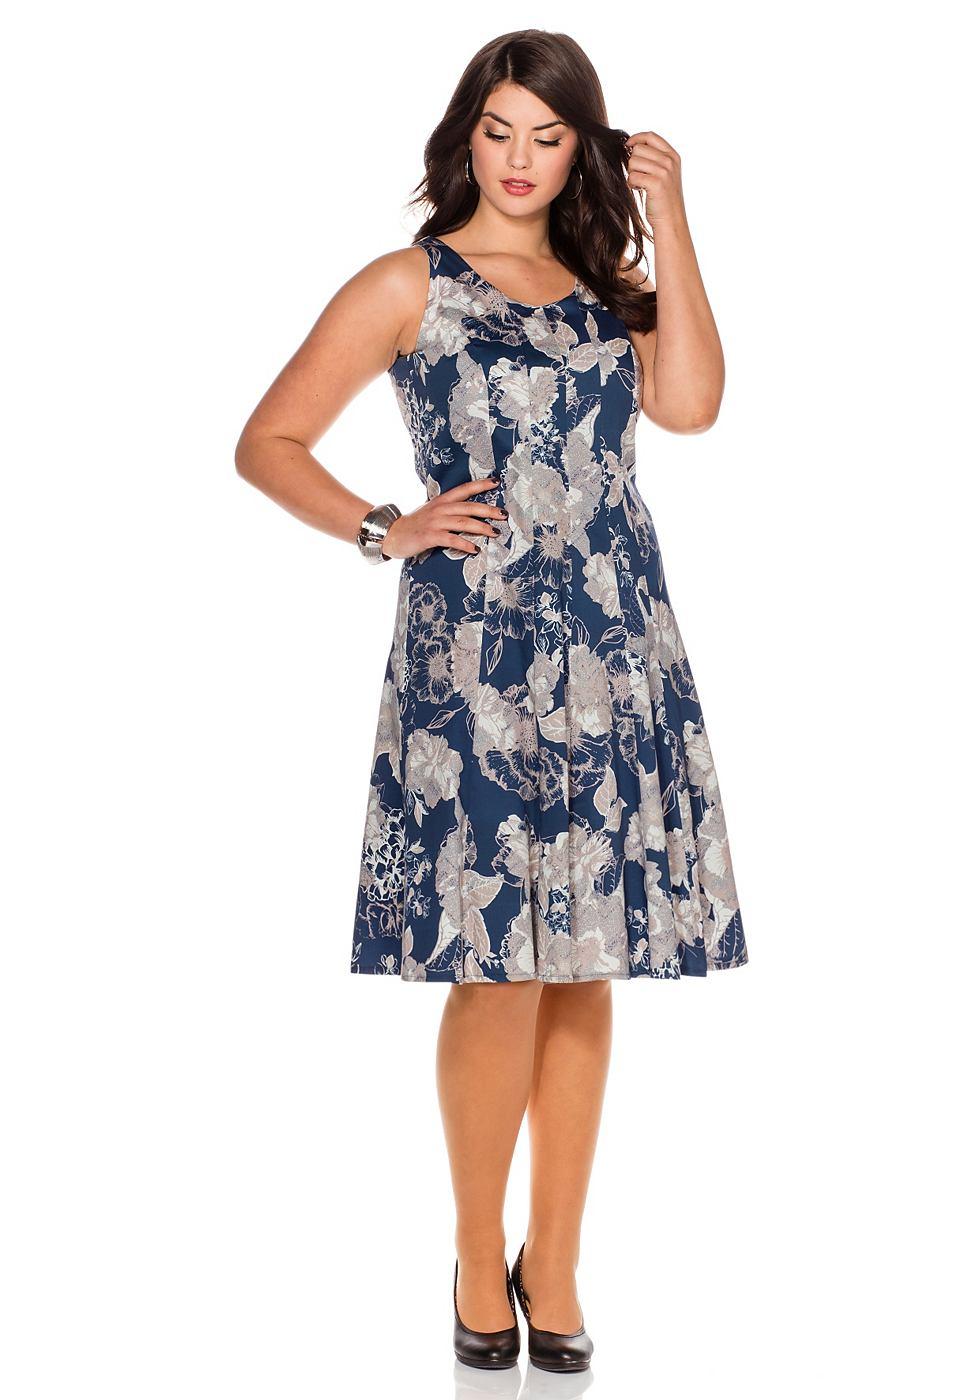 Sheego Style jurk in kokermodel blauw